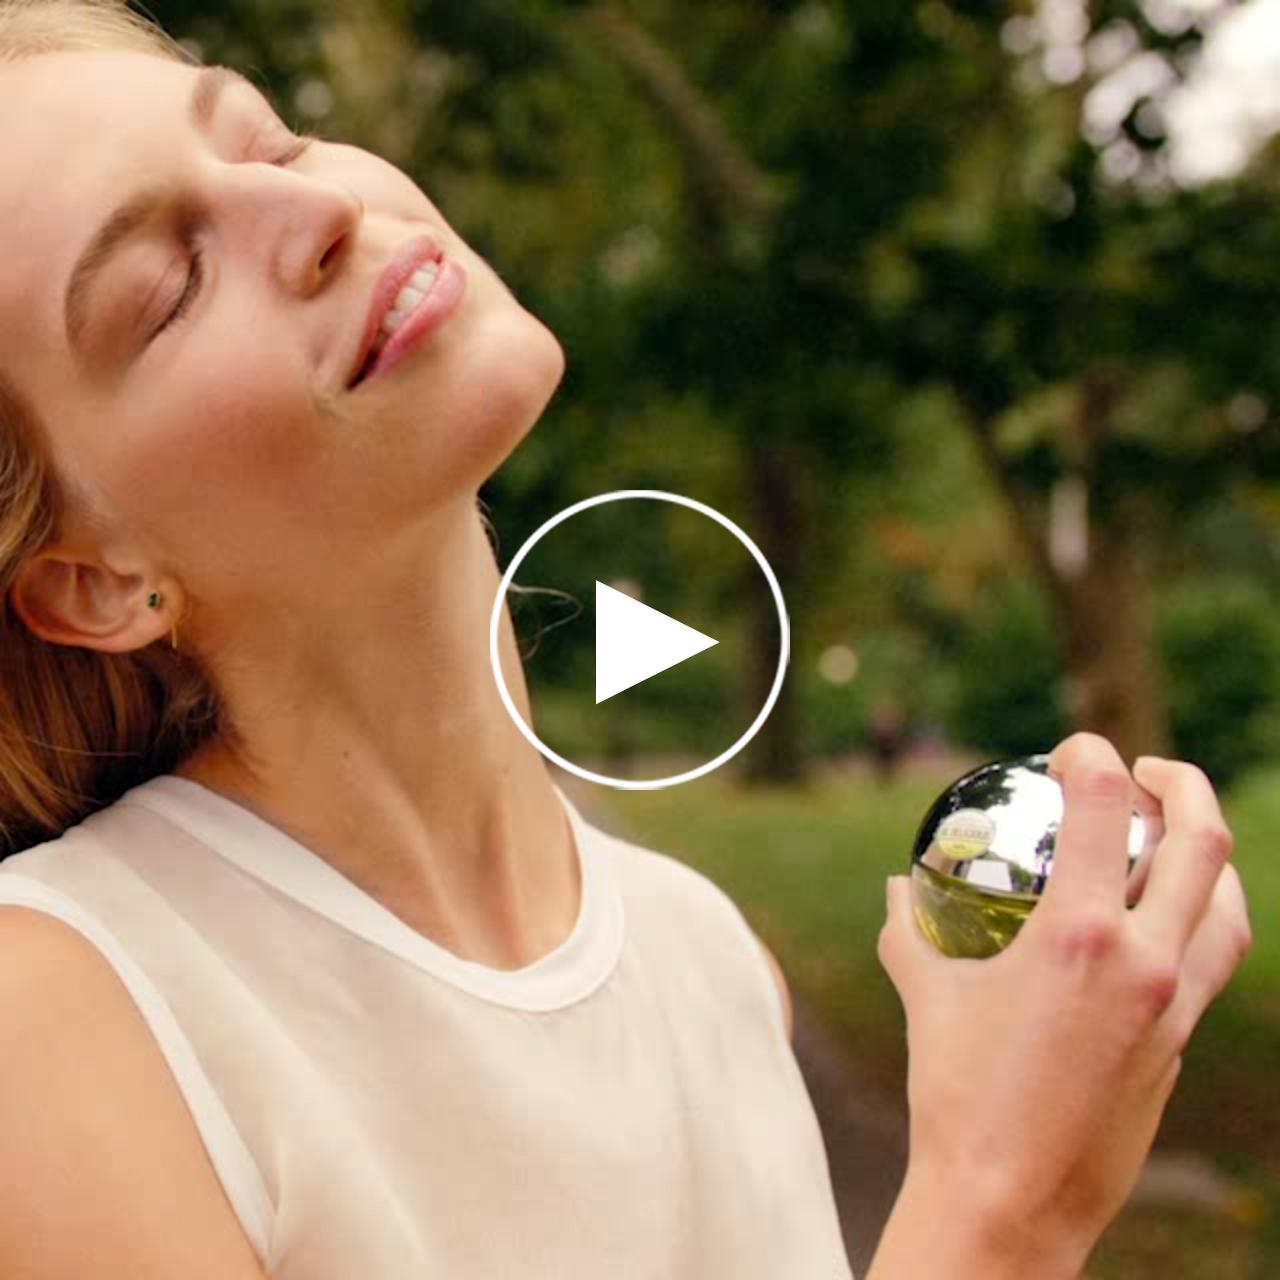 Parfümerie Pieper online - DKNY - Be Delicious - Video